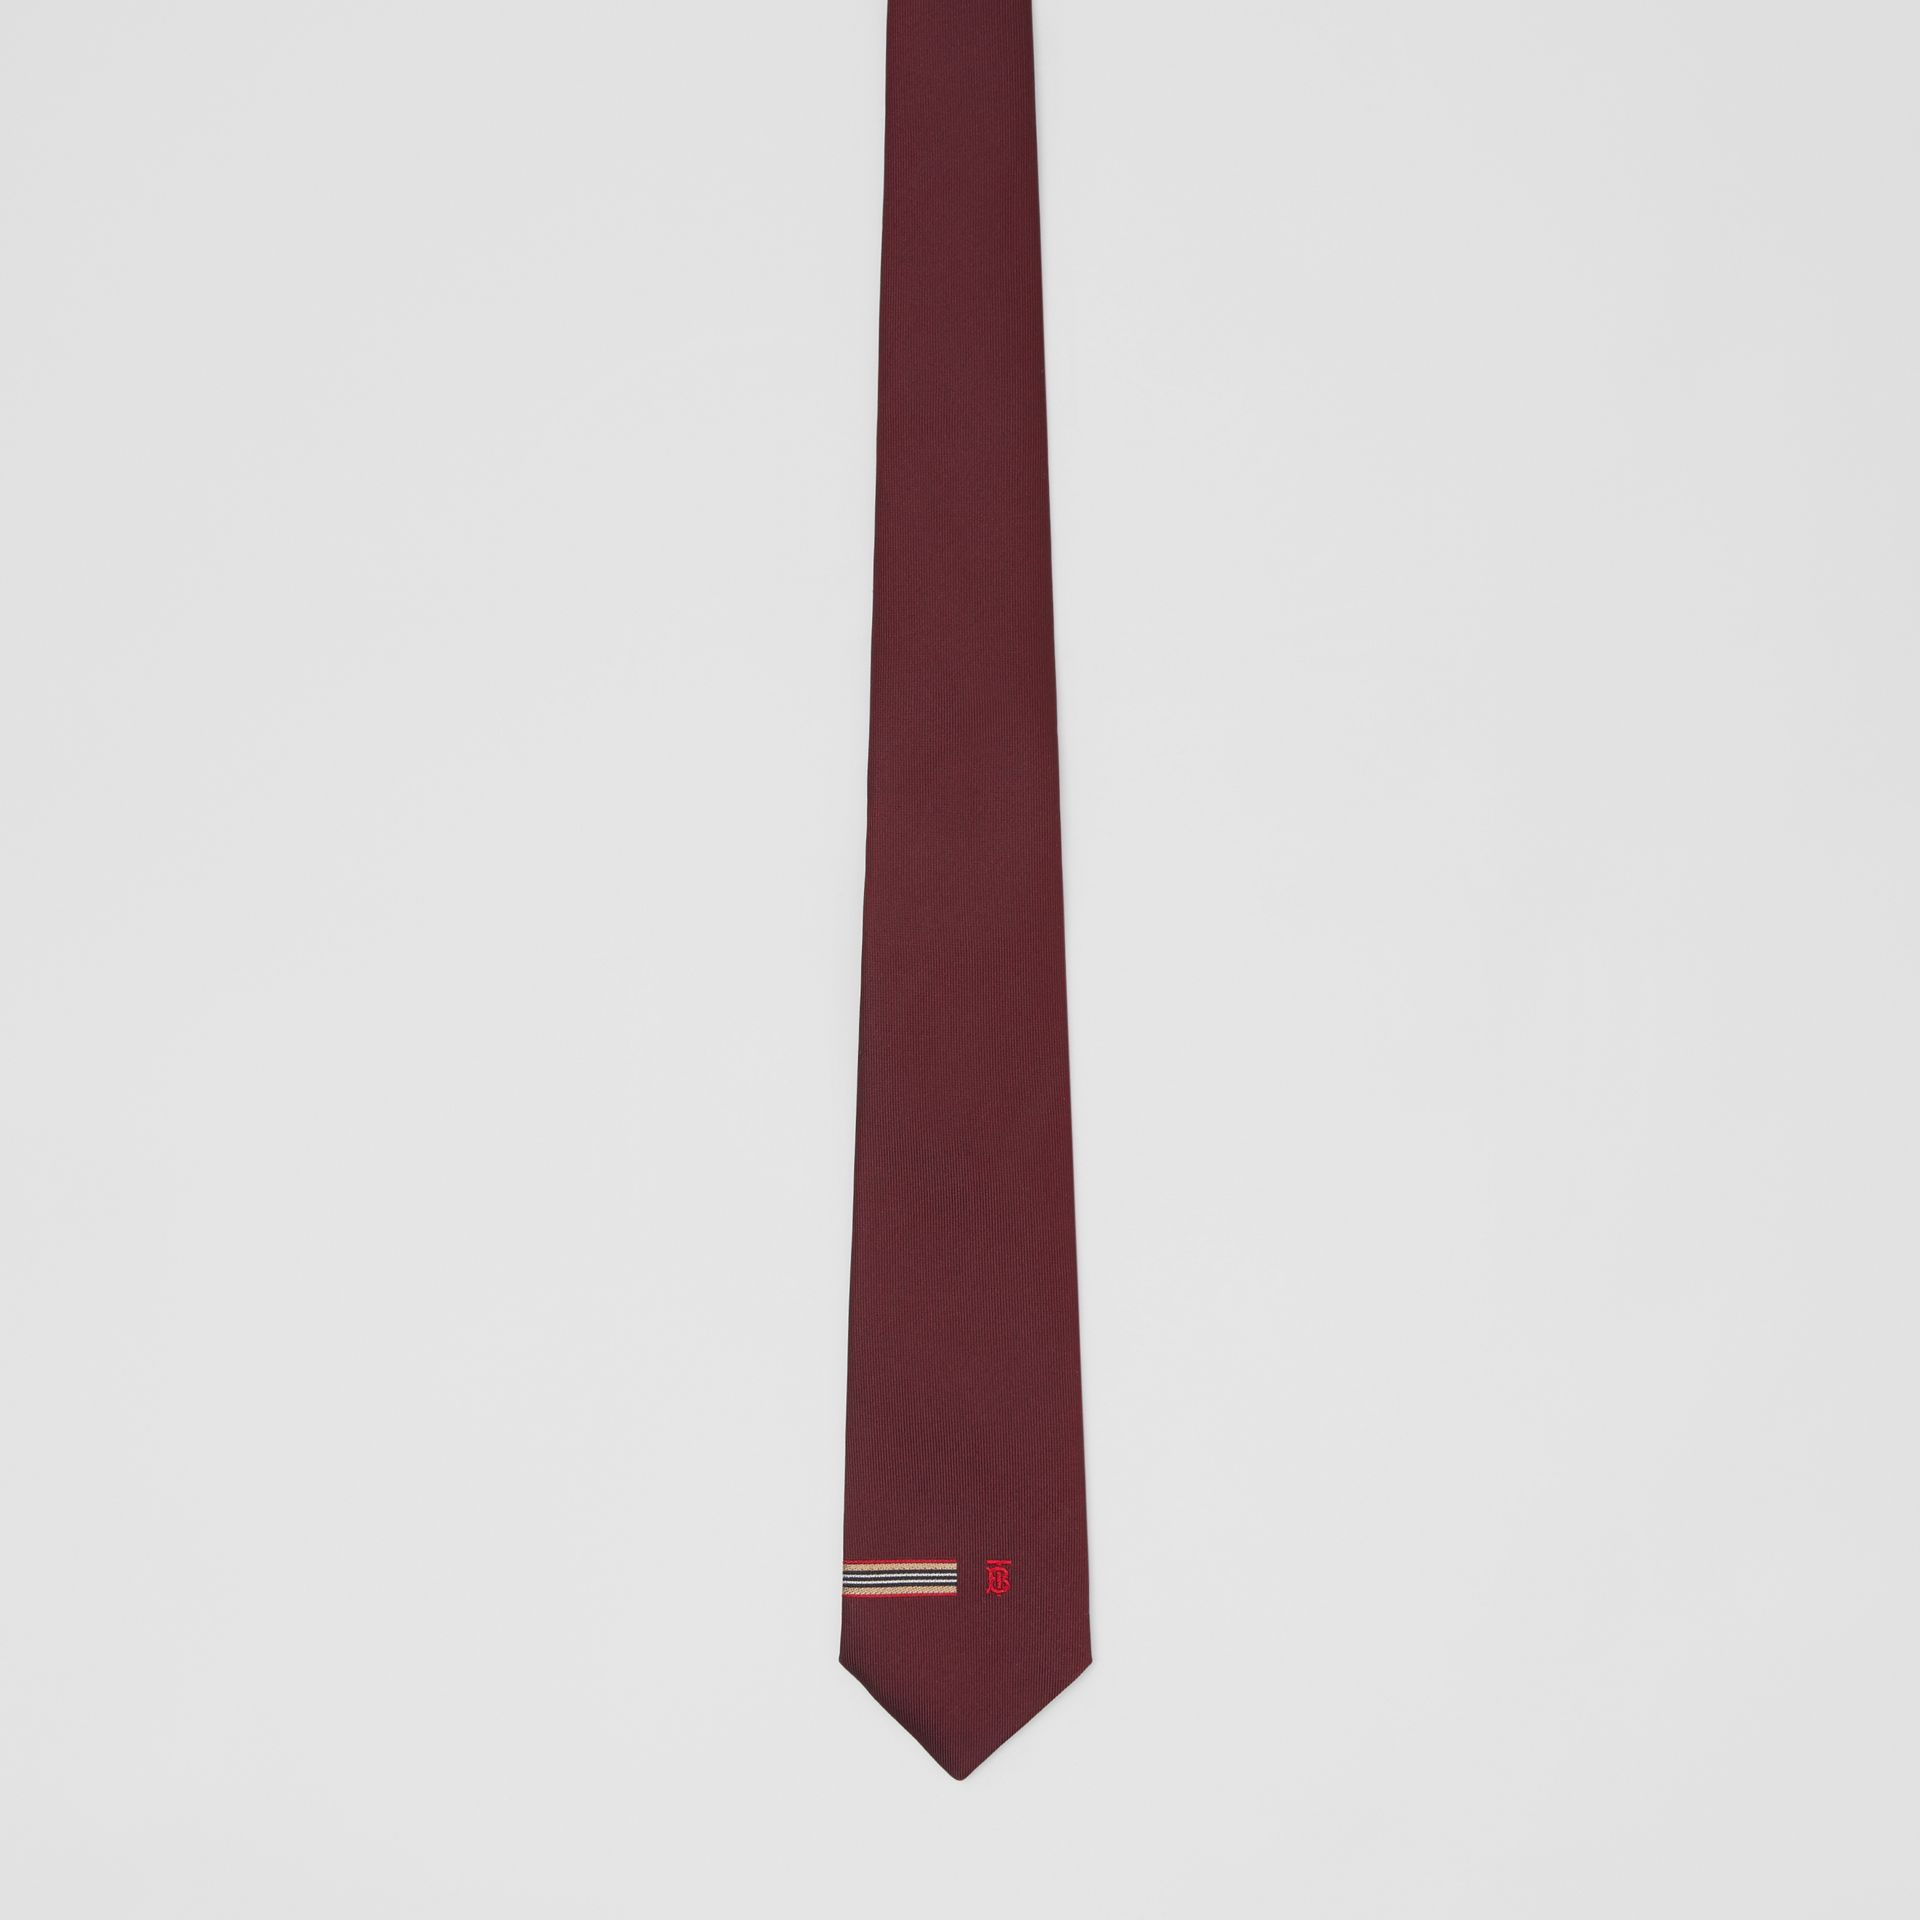 Classic Cut Icon Stripe and Monogram Motif Silk Tie in Claret - Men | Burberry - gallery image 2